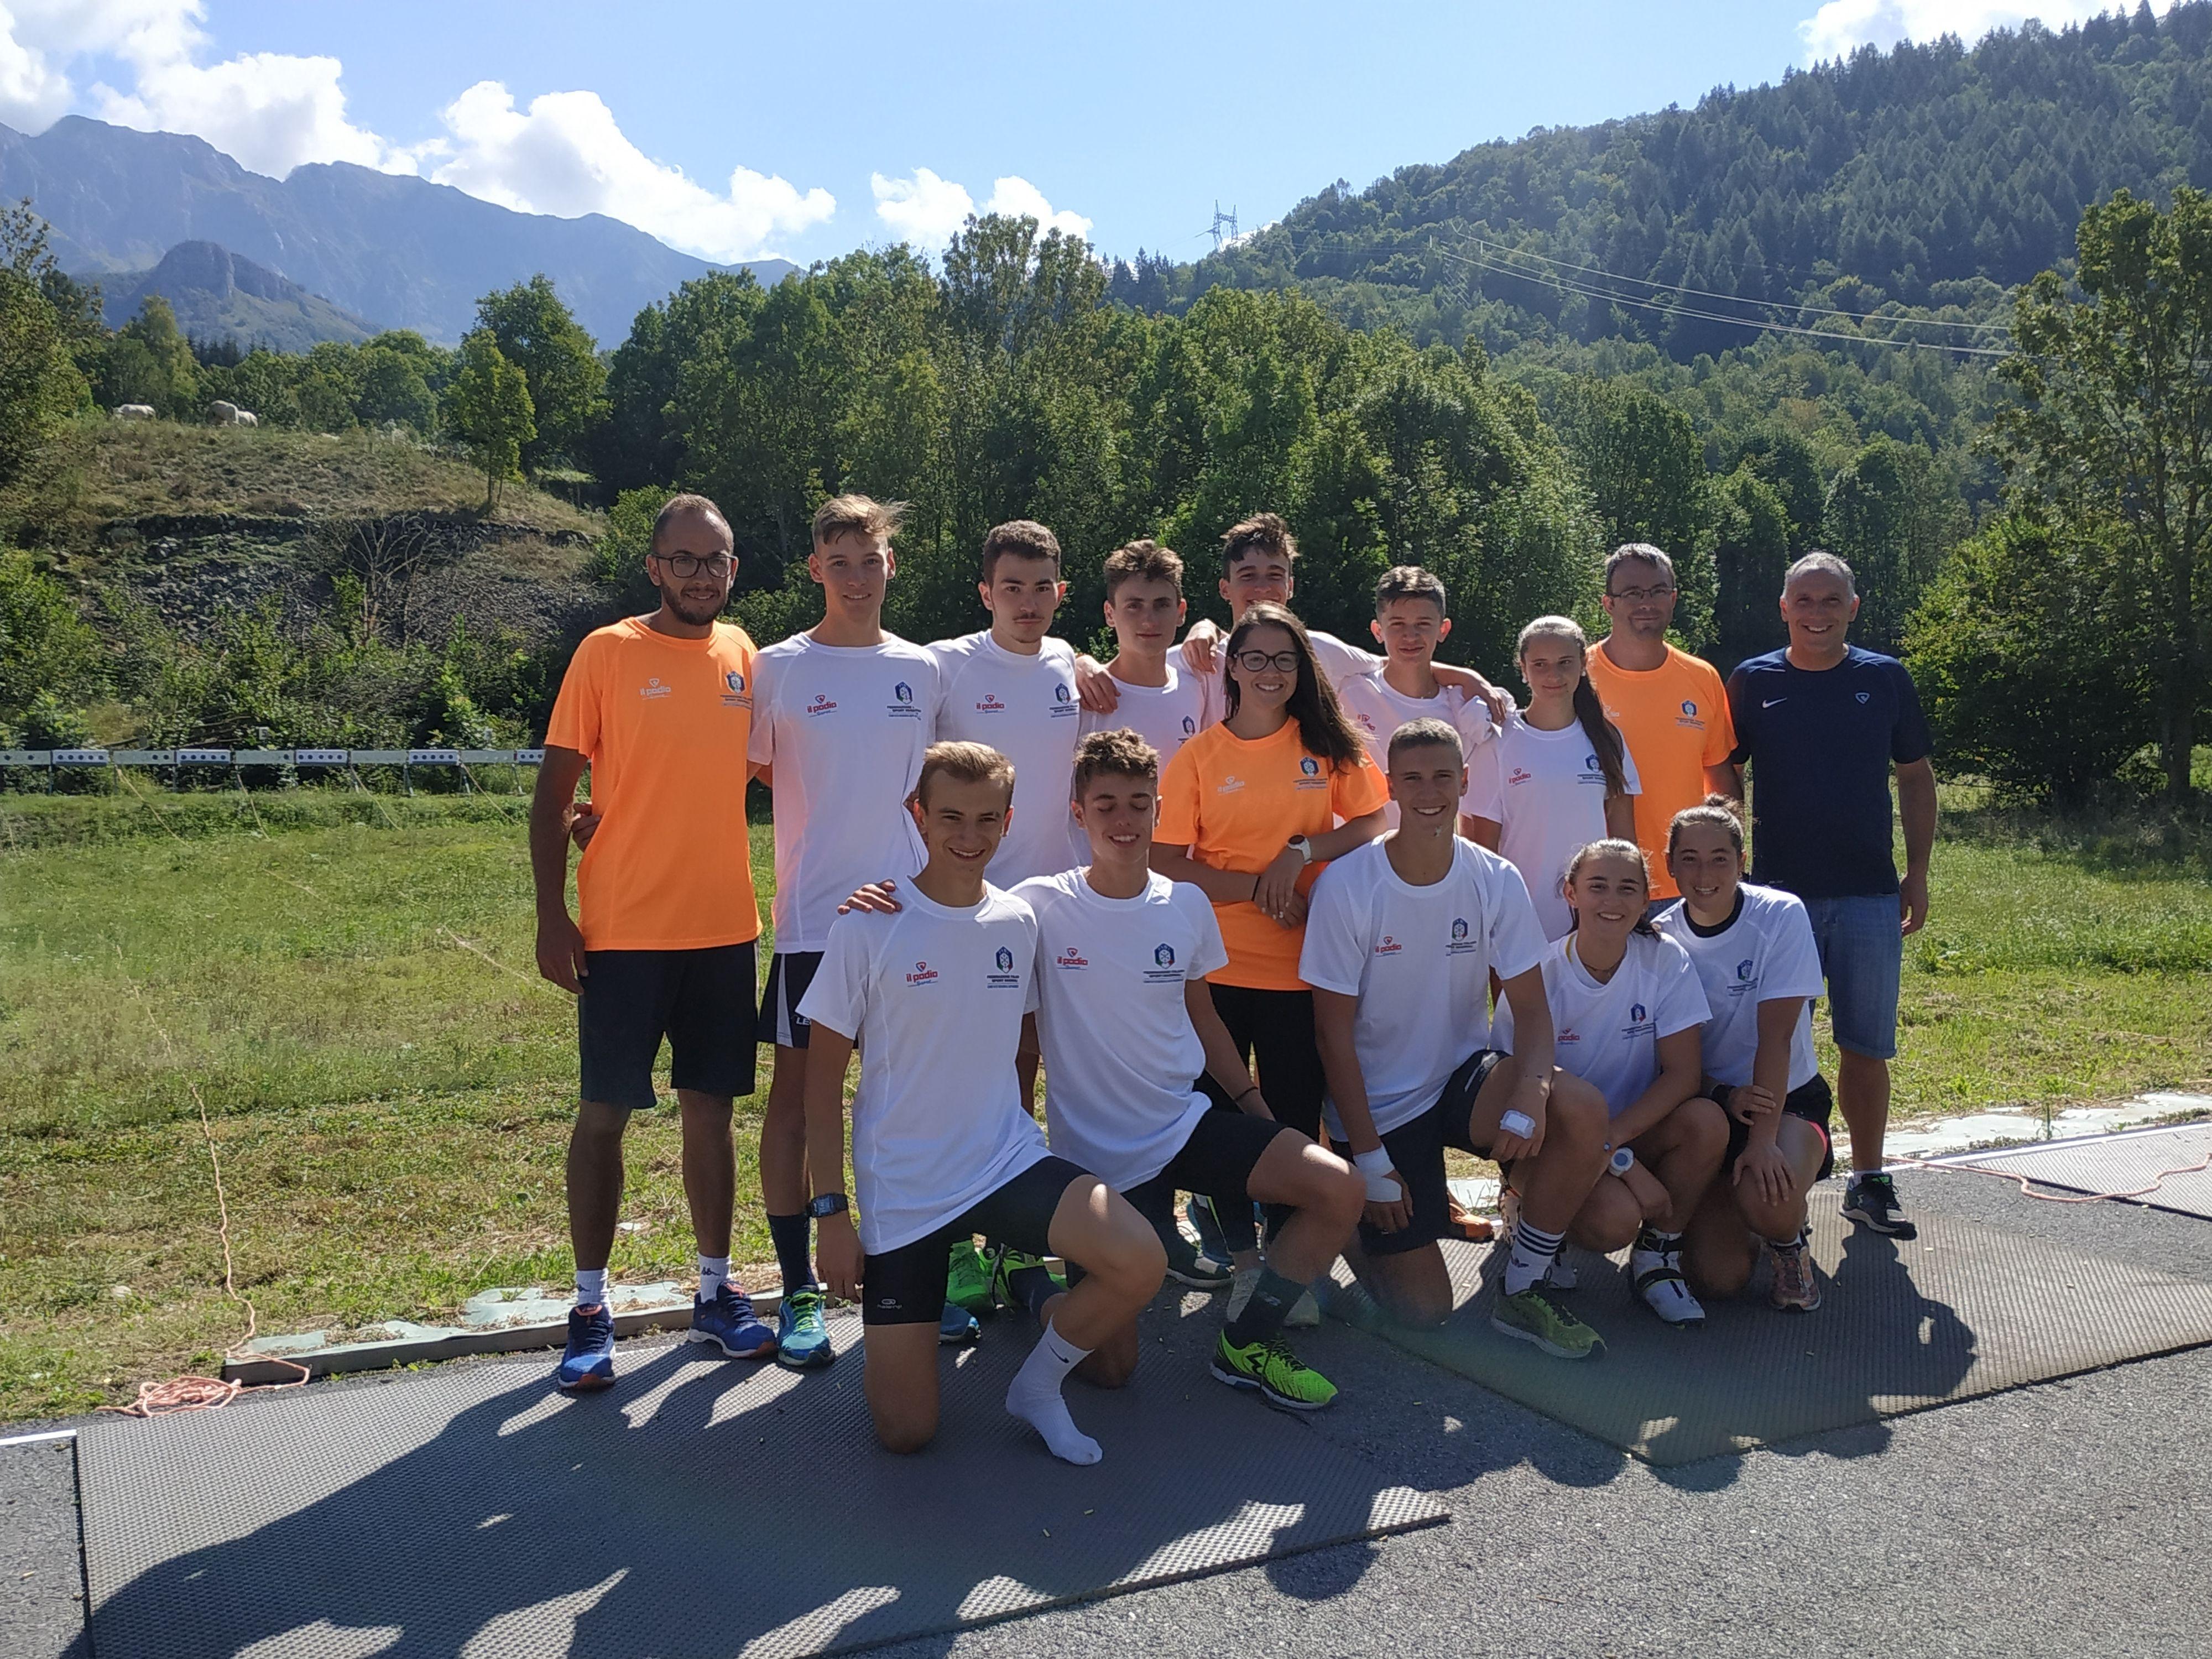 Fisi Aoc Calendario Gare.Biathlon I Piemontesi Convocati Per I Campionati Italiani